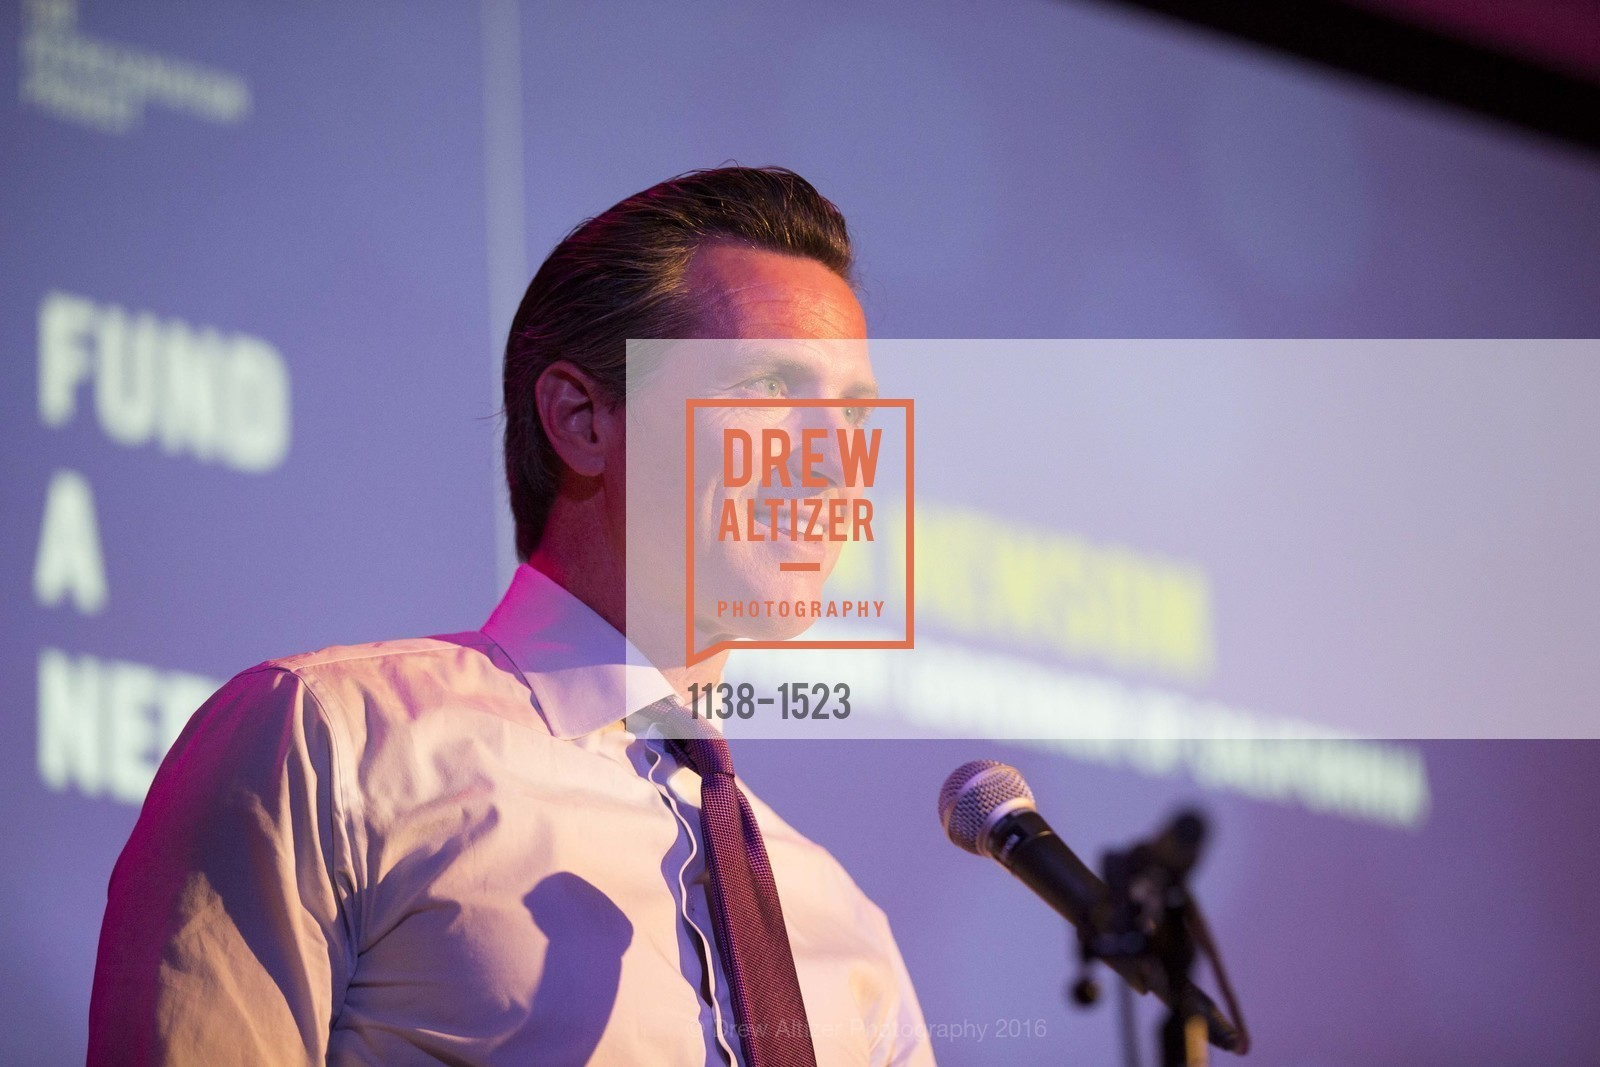 Gavin Newsom, Photo #1138-1523